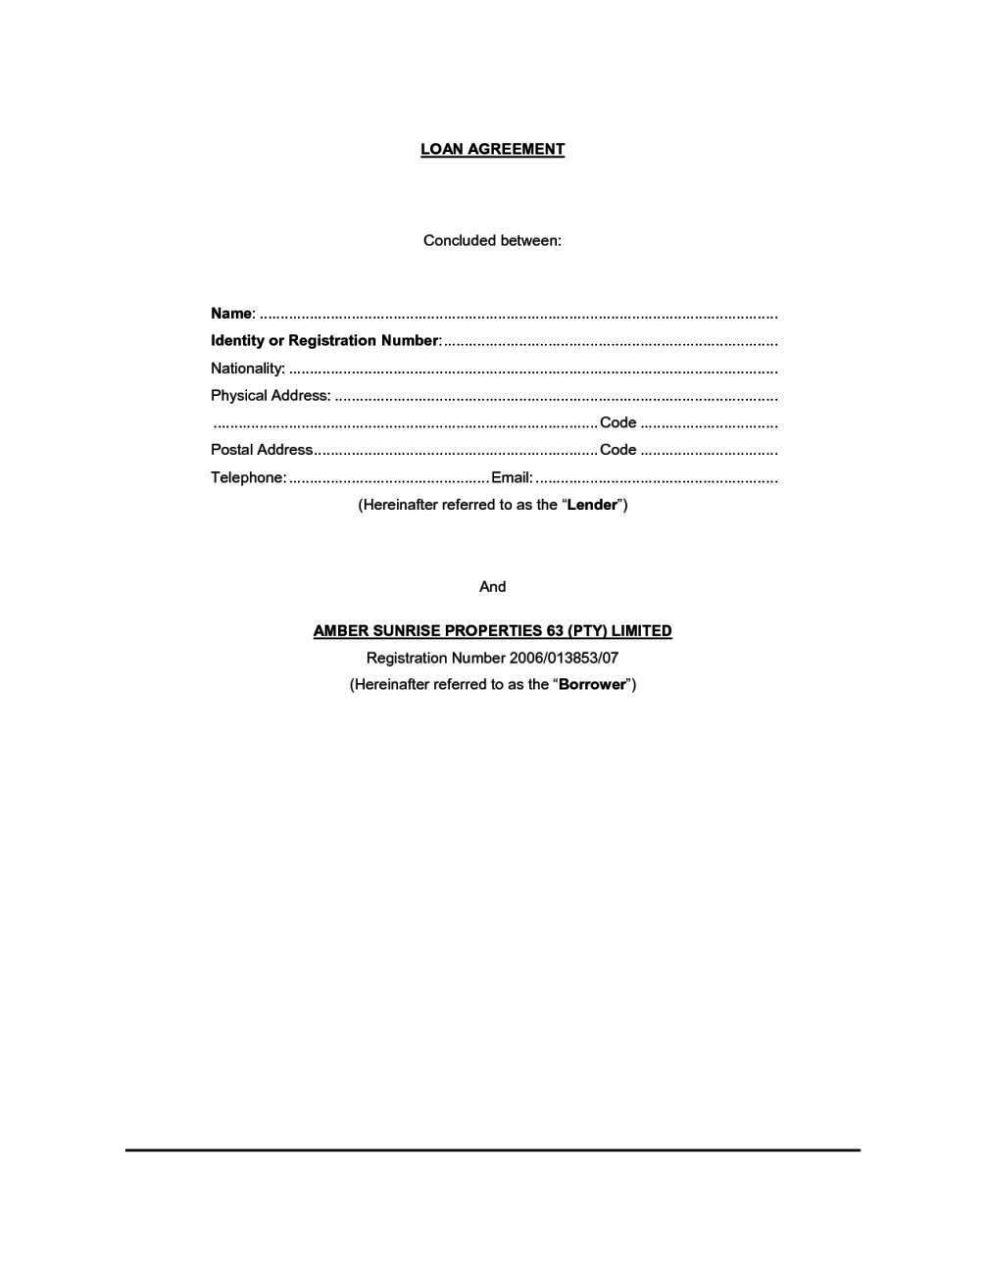 Simple Loan Agreement Template Word - SampleTemplatess ...